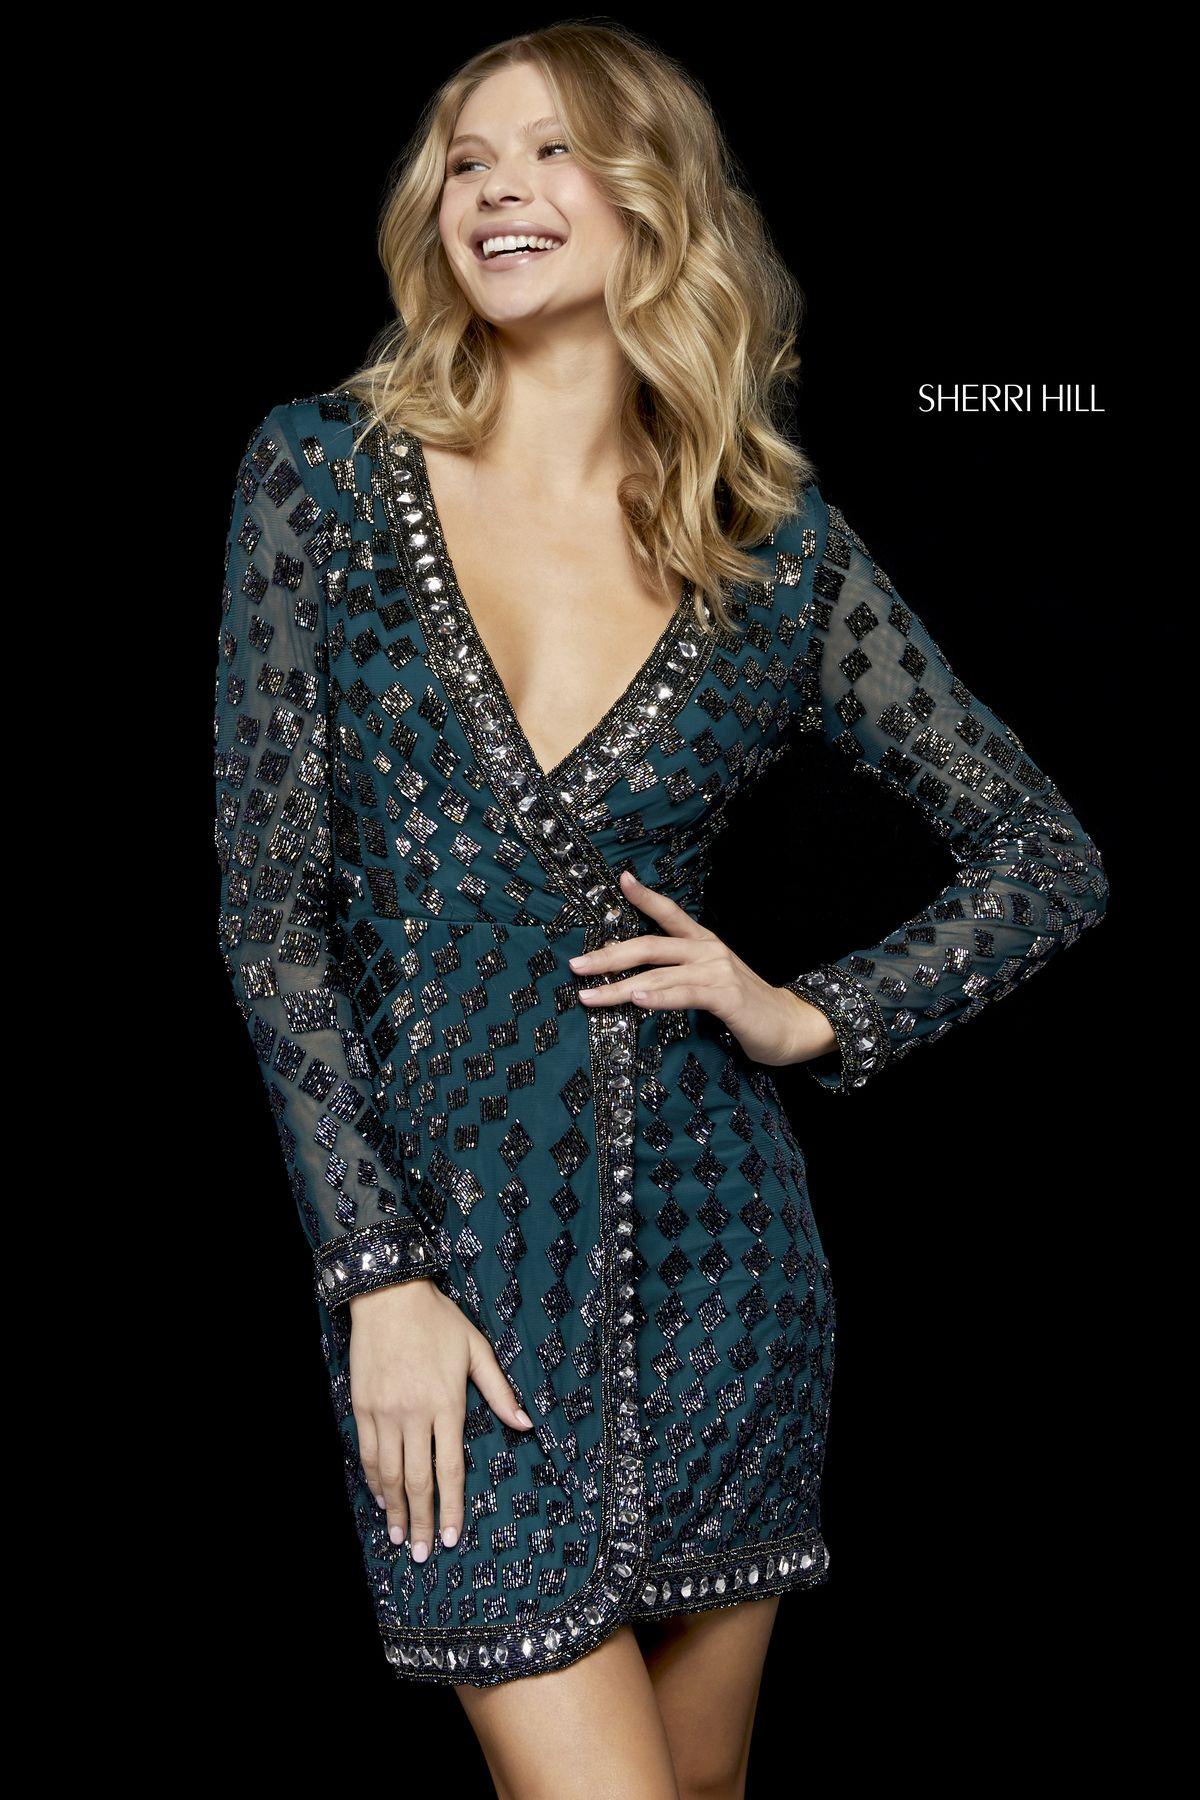 f9f5bda62c7 Style  52221 – Sherri Hill. Style  52221 – Sherri Hill Long Sleeve  Homecoming Dresses ...